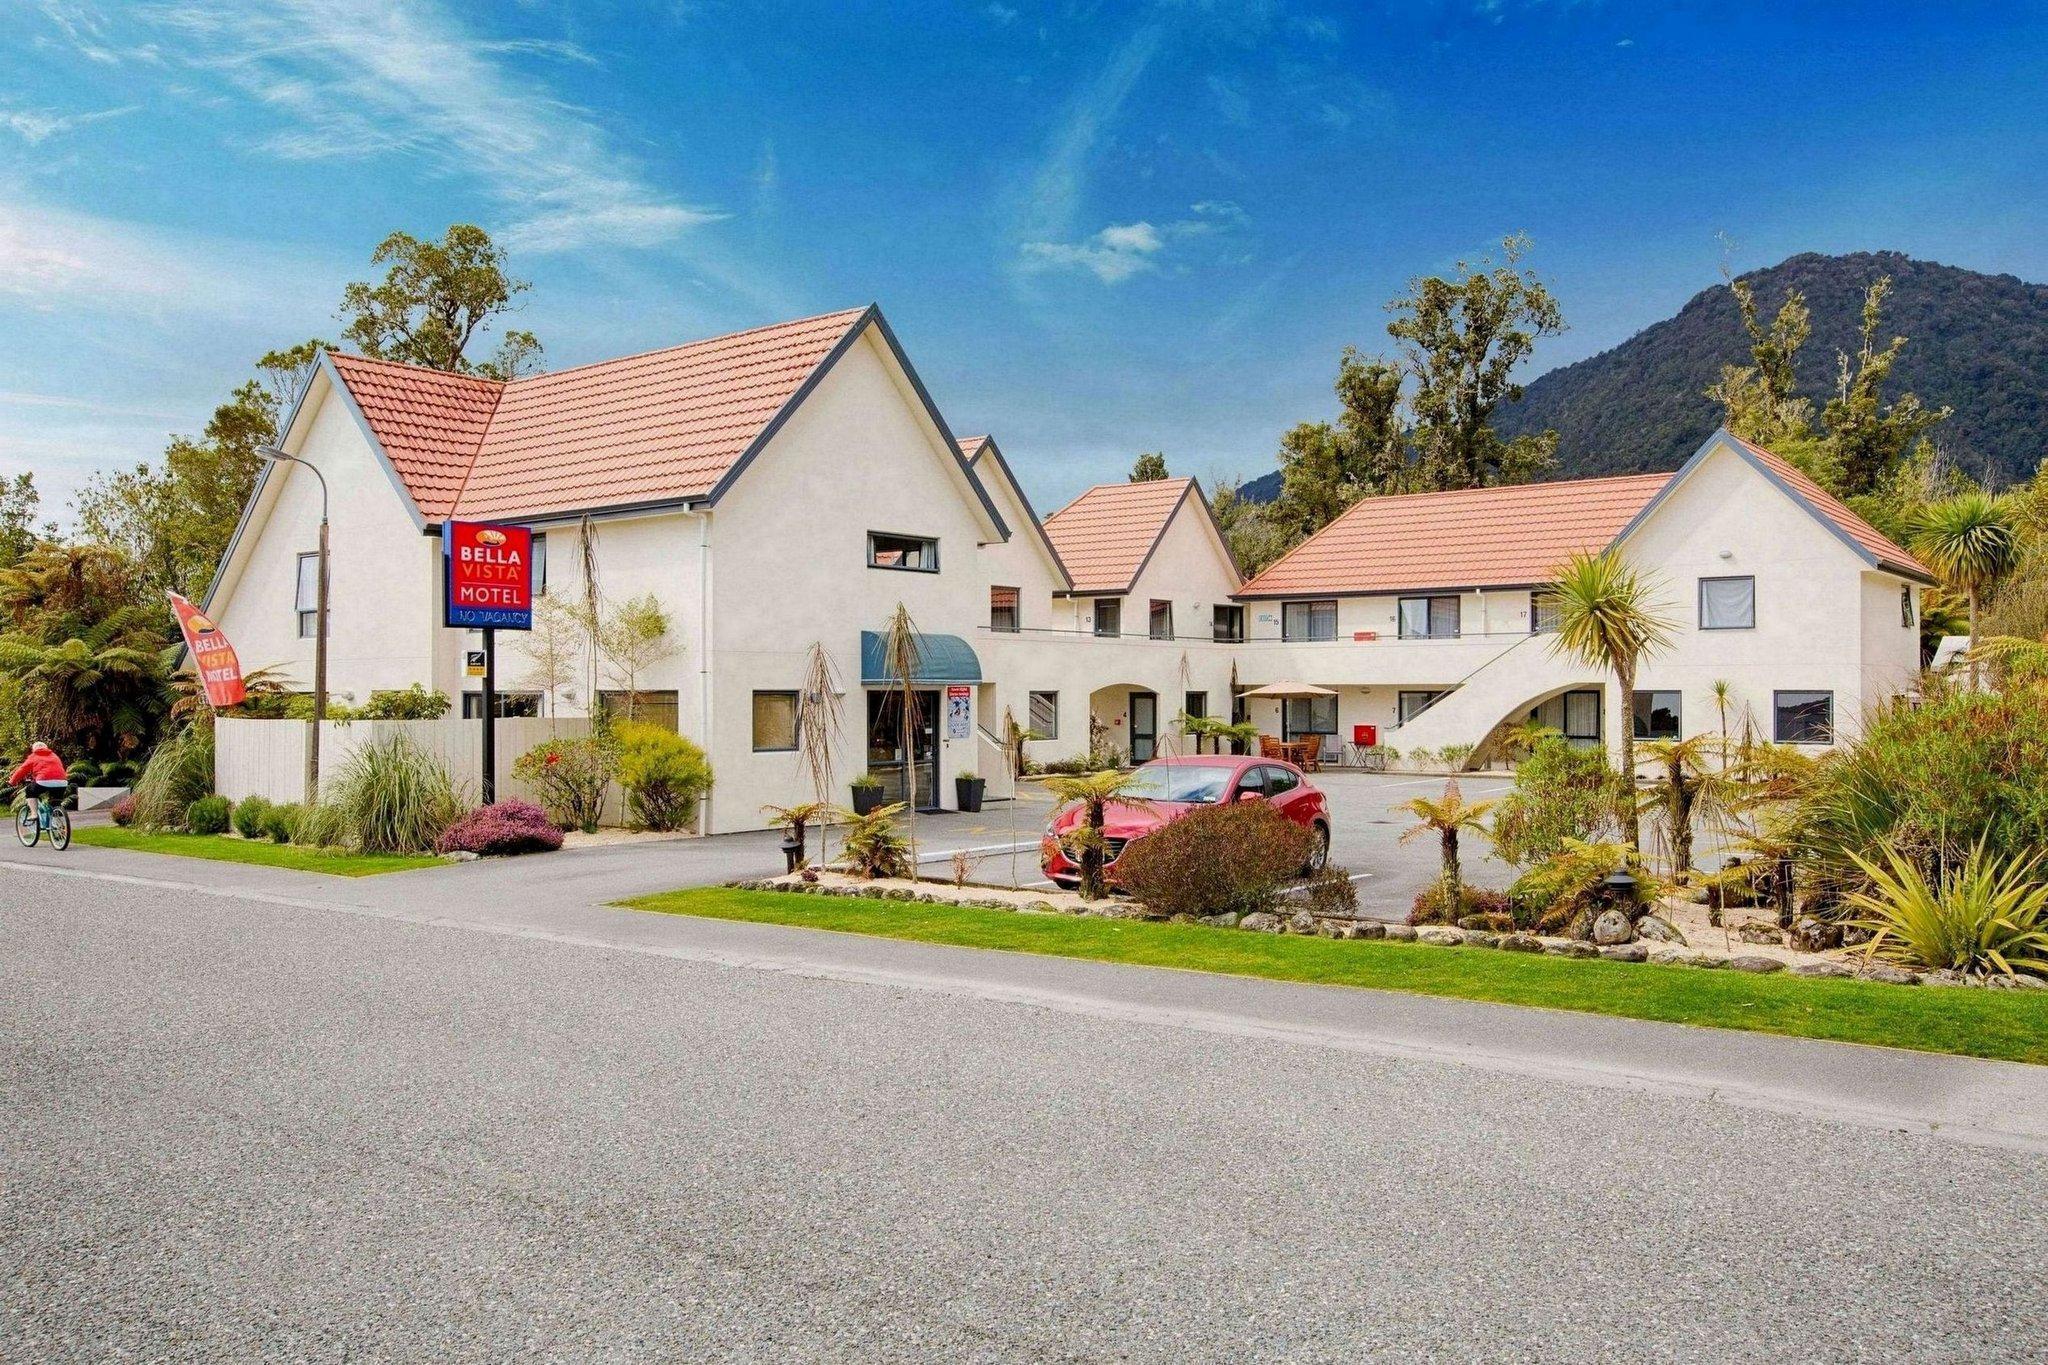 Bella Vista Motel Franz Josef